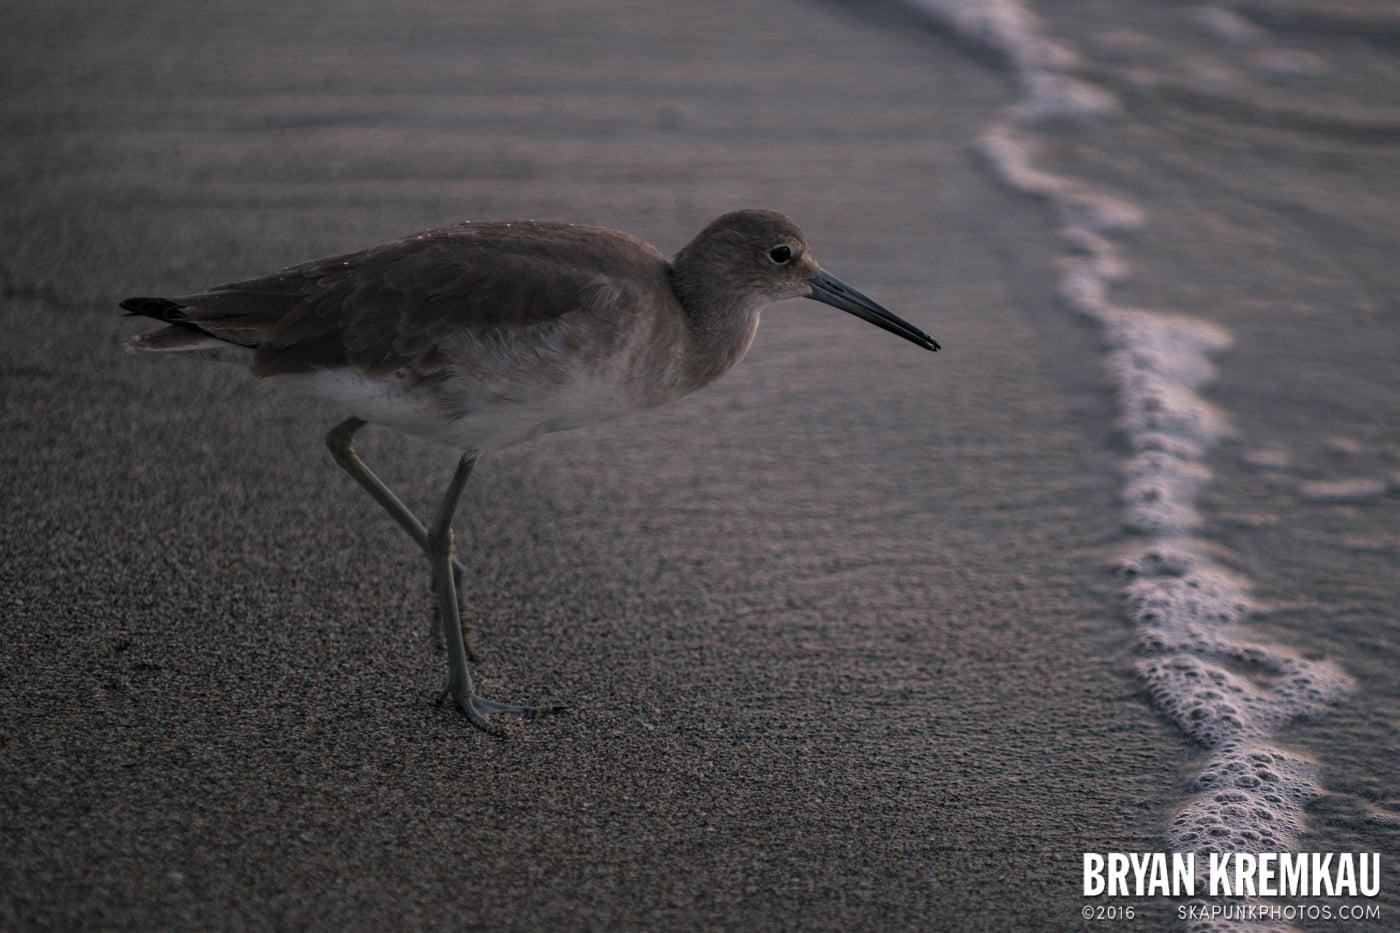 Sunsets, Astrophotography & Birds @ Venice, Florida - 10.25.14 - 11.5.14 (113)